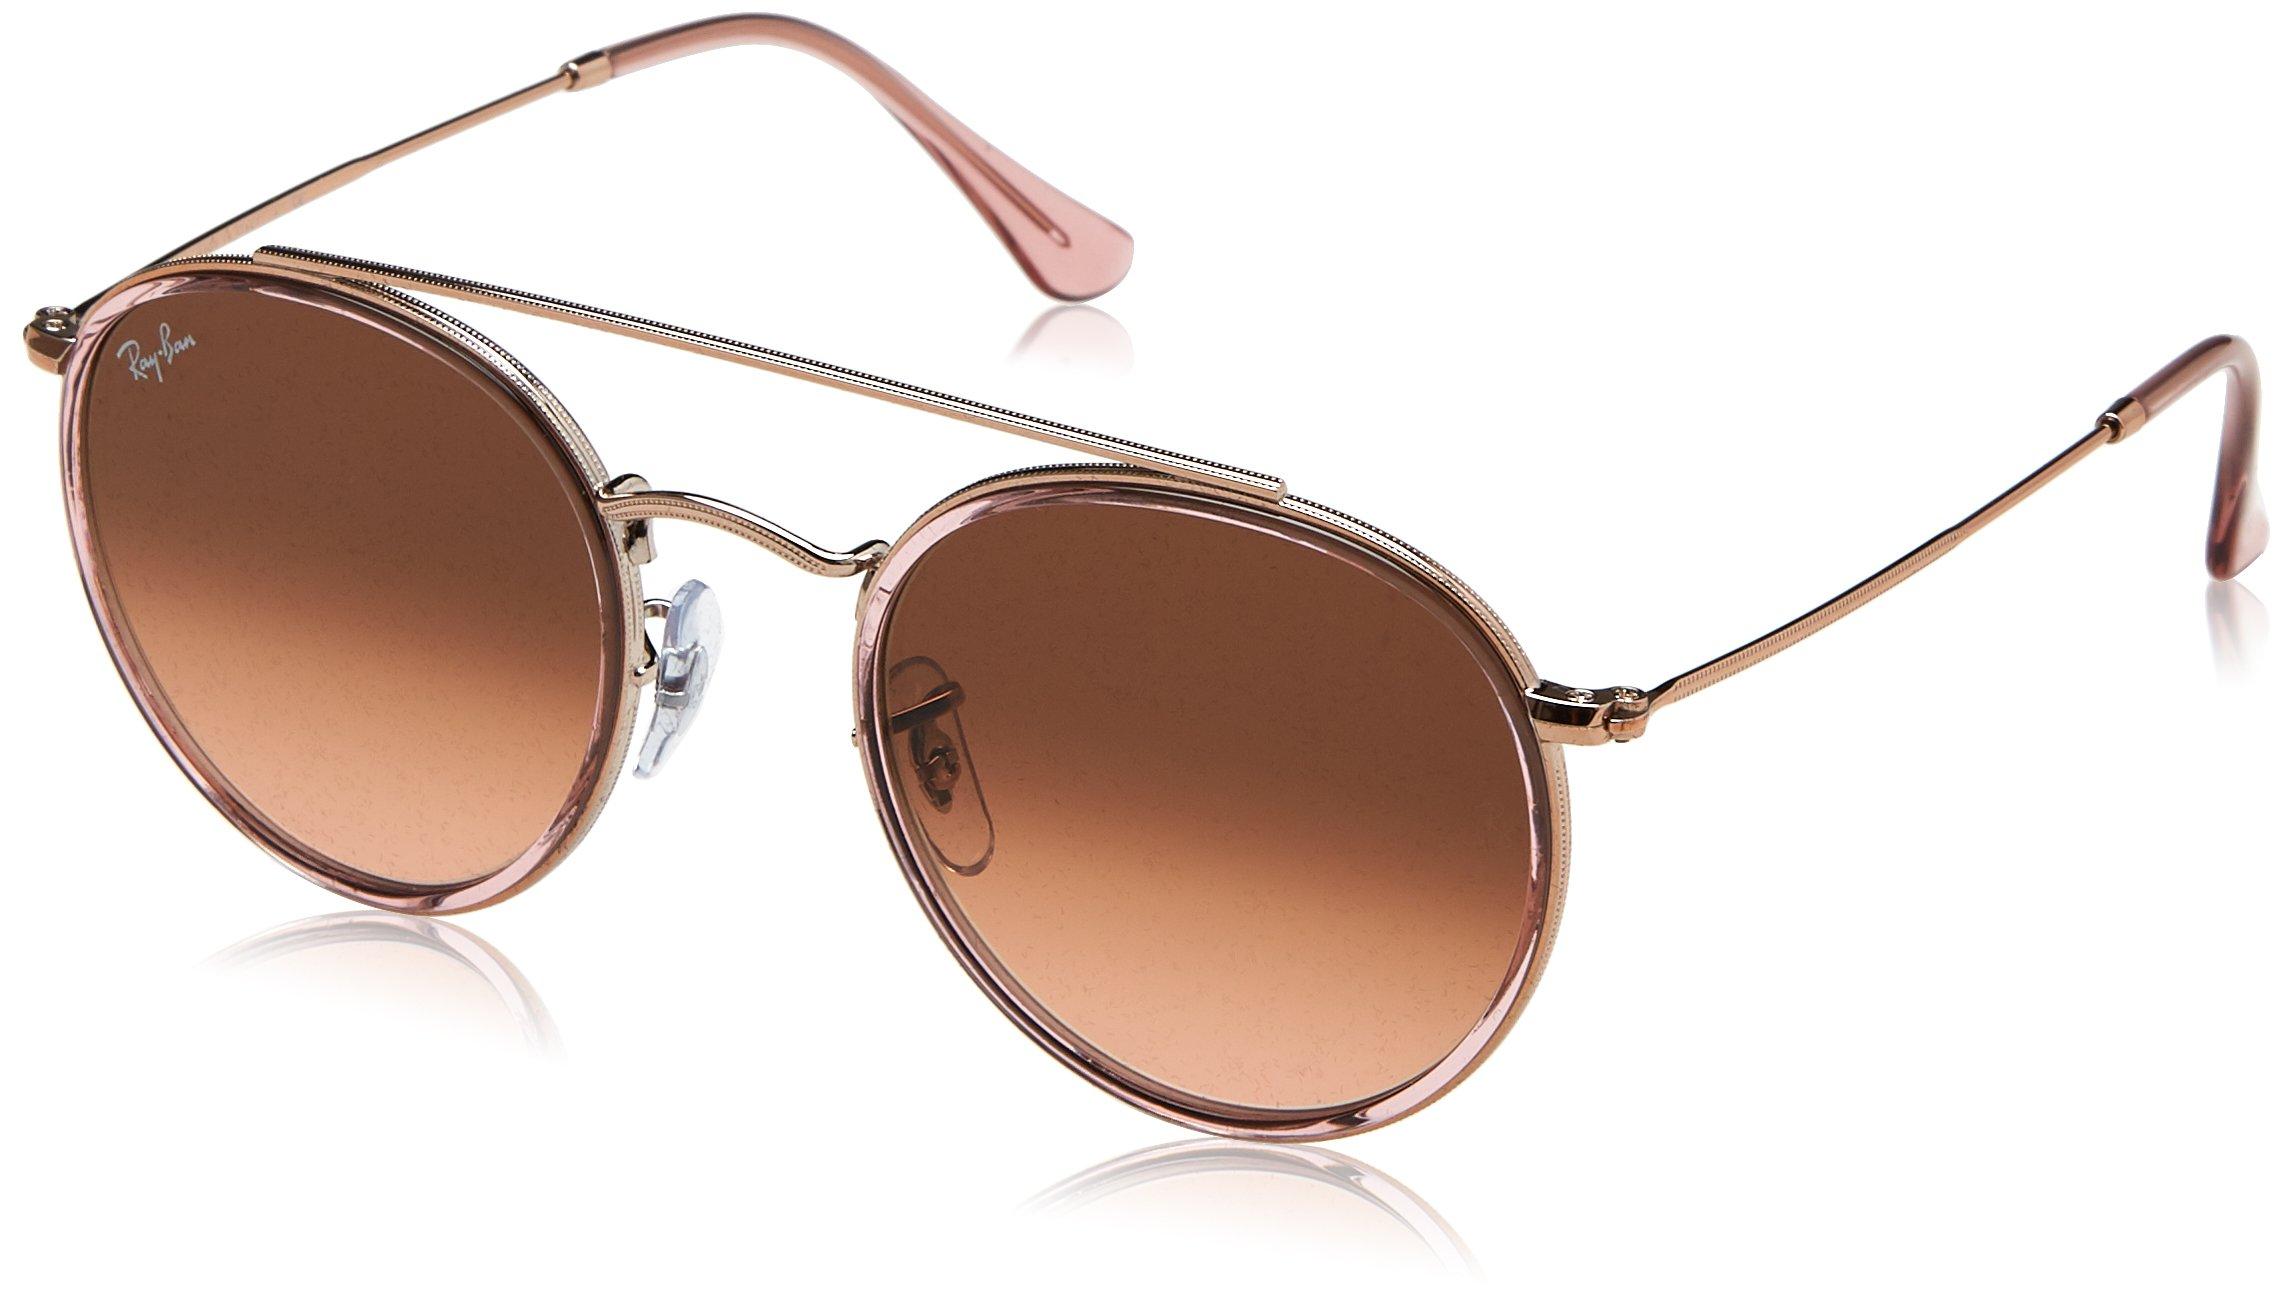 Ray-Ban Metal Unisex Aviator Sunglasses, Pink, 51 mm